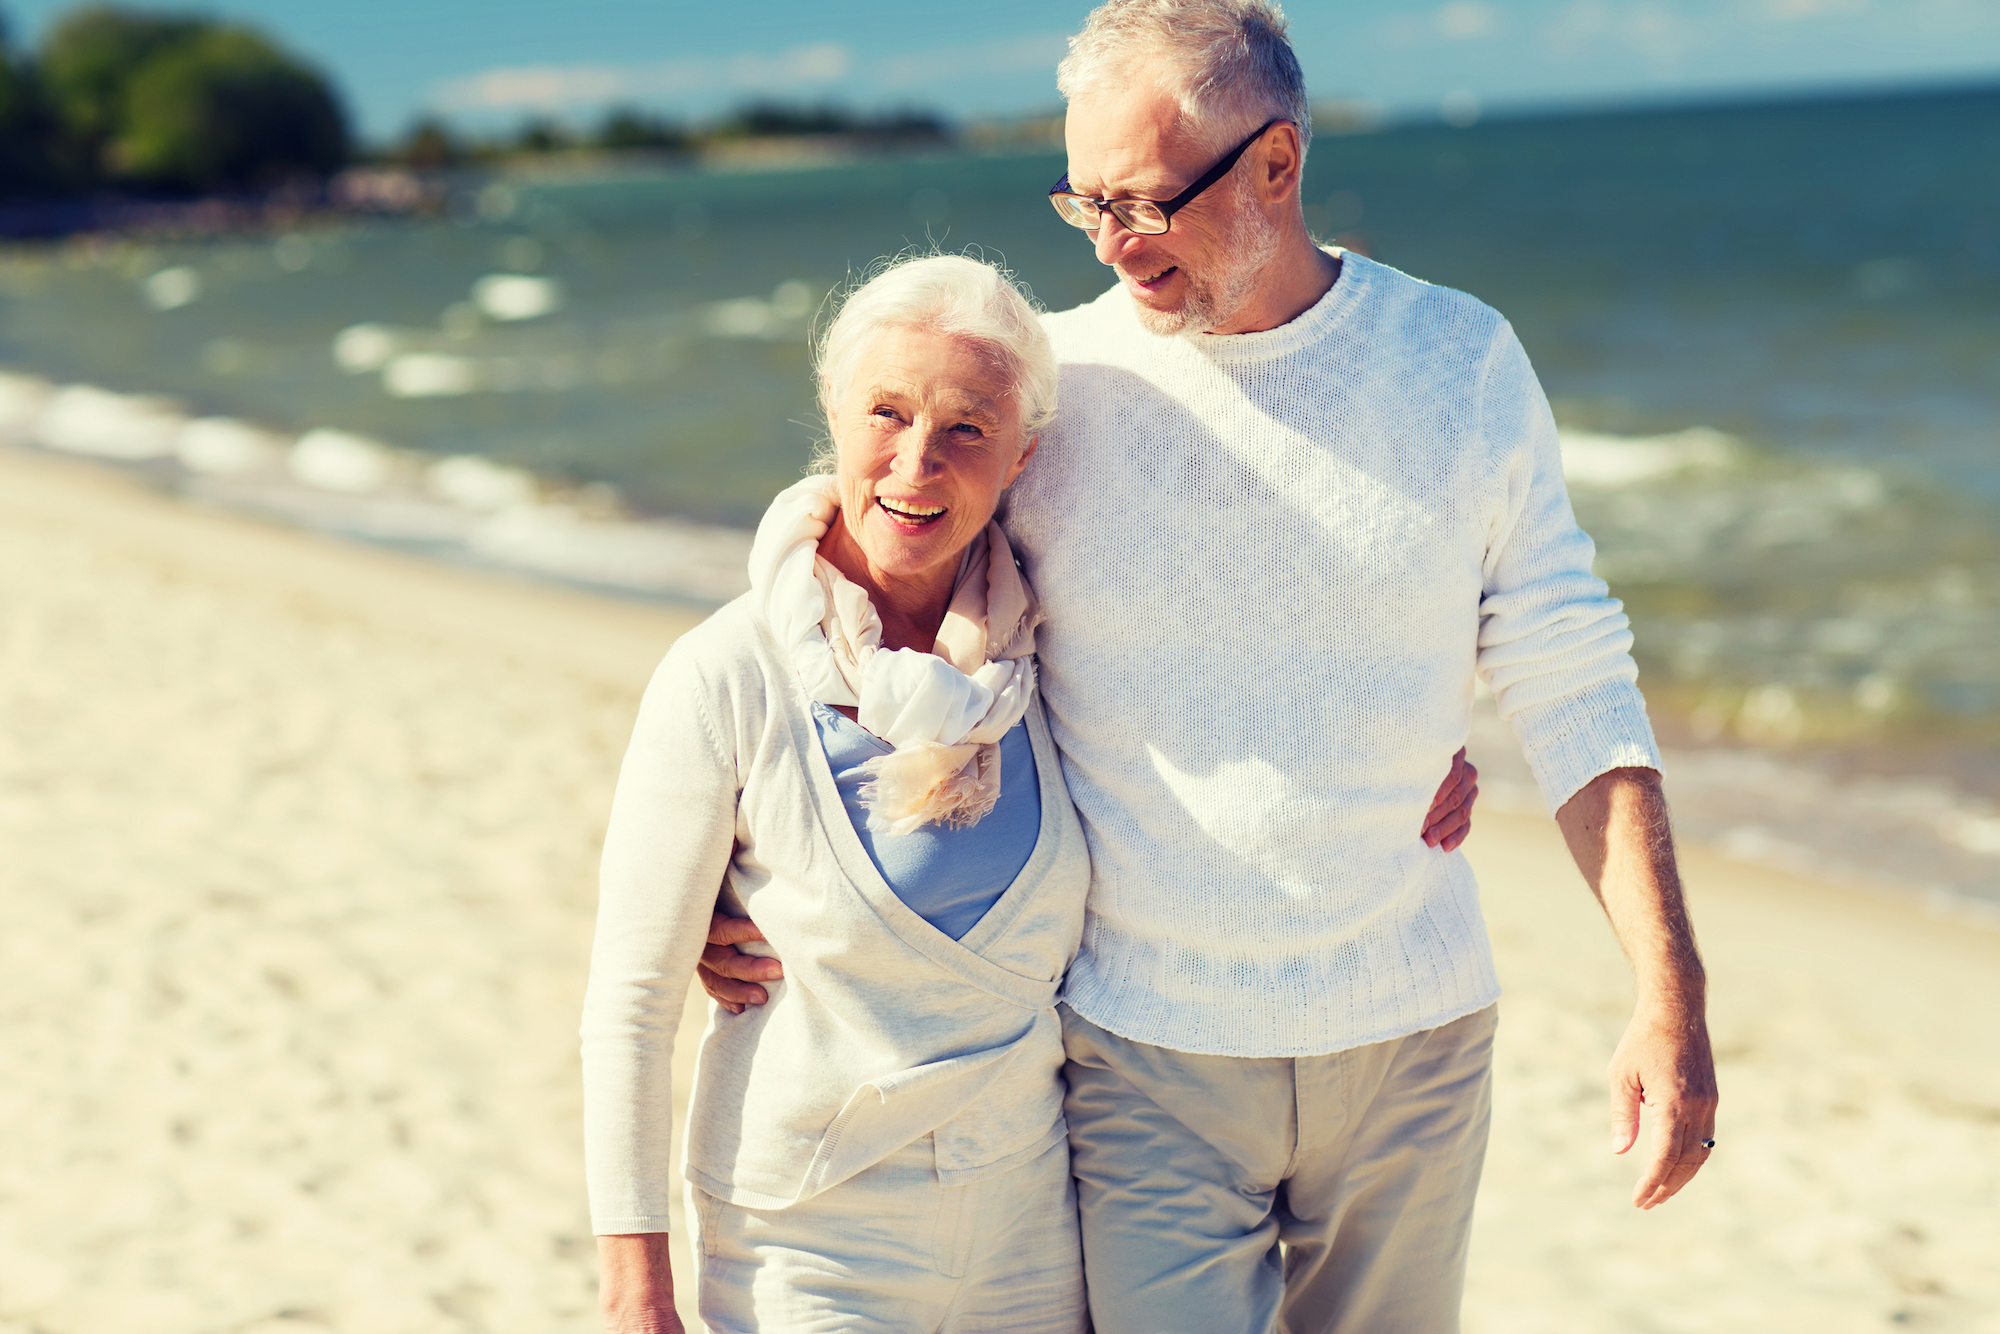 bigstock-family-age-travel-tourism-a-168813518.jpg